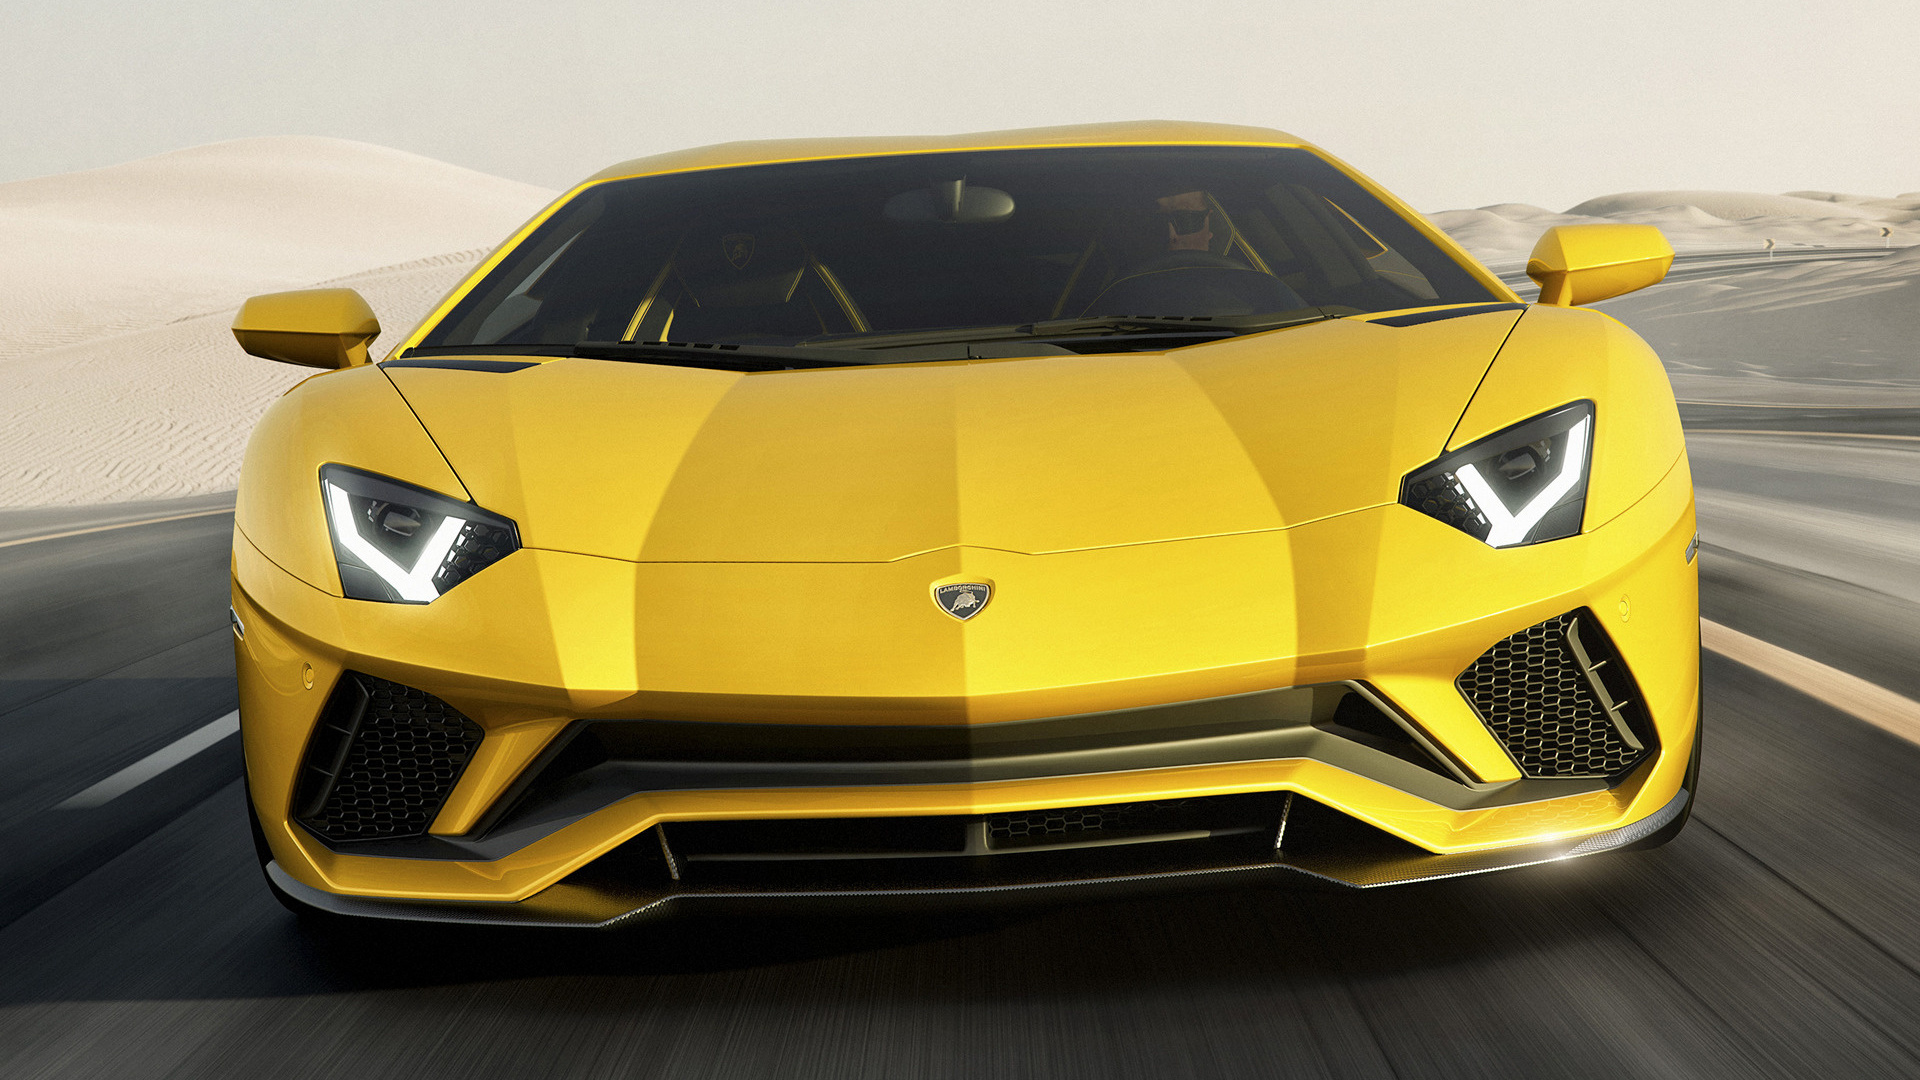 2016 Dodge Ram >> 2017 Lamborghini Aventador S - Wallpapers and HD Images ...